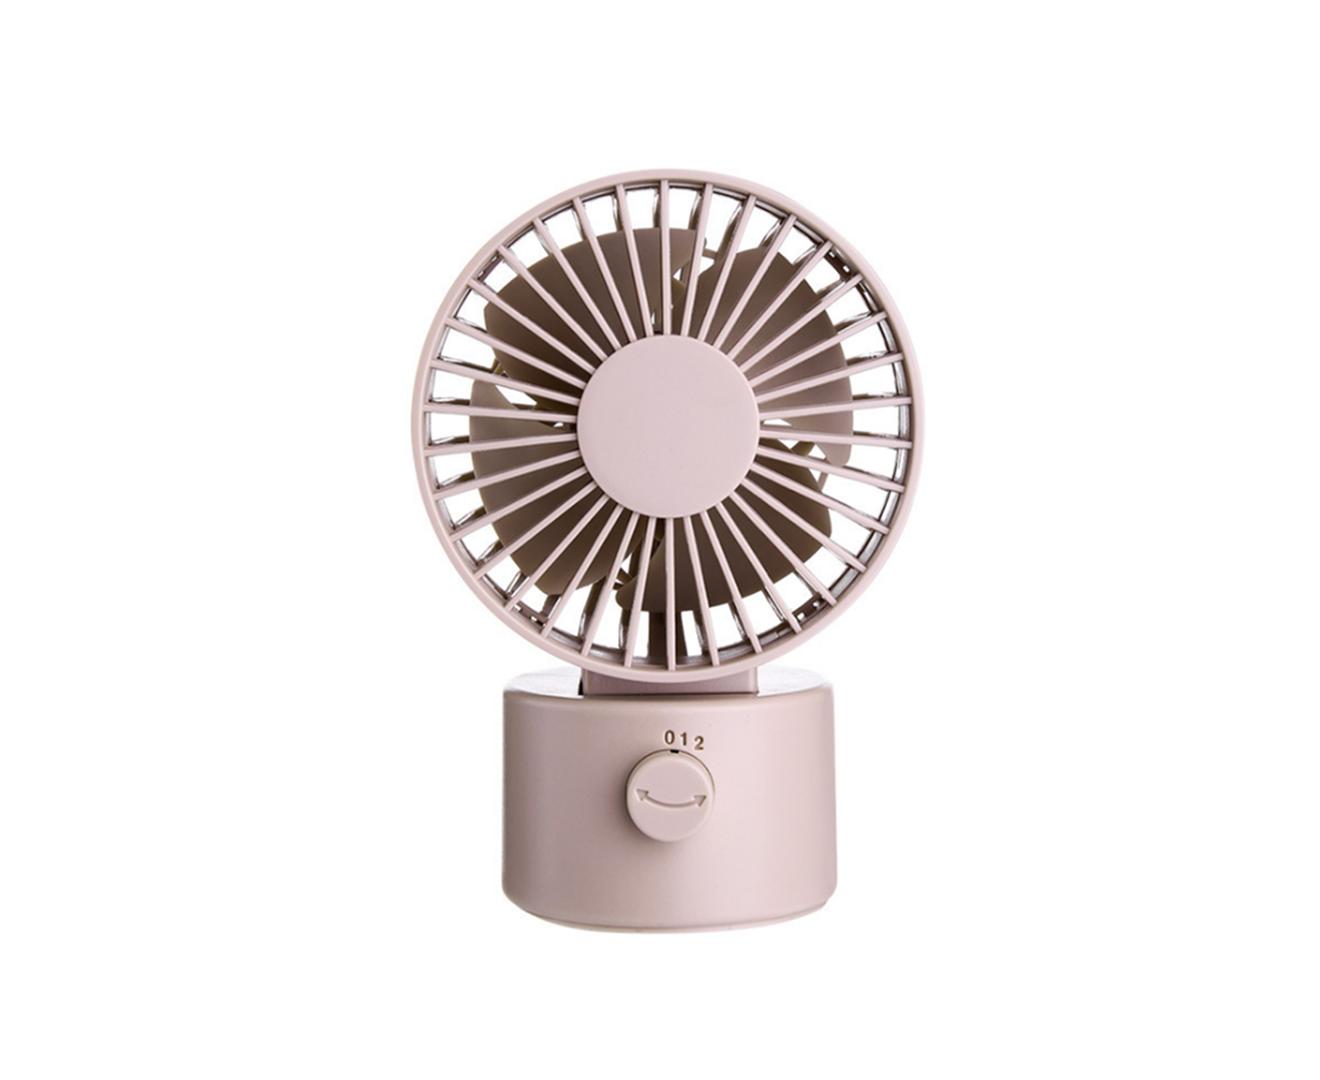 Rotating Shaking Head 2-speed Small Fan USB Creative Desktop Mini Silent 4-blade Fan Cooling Device